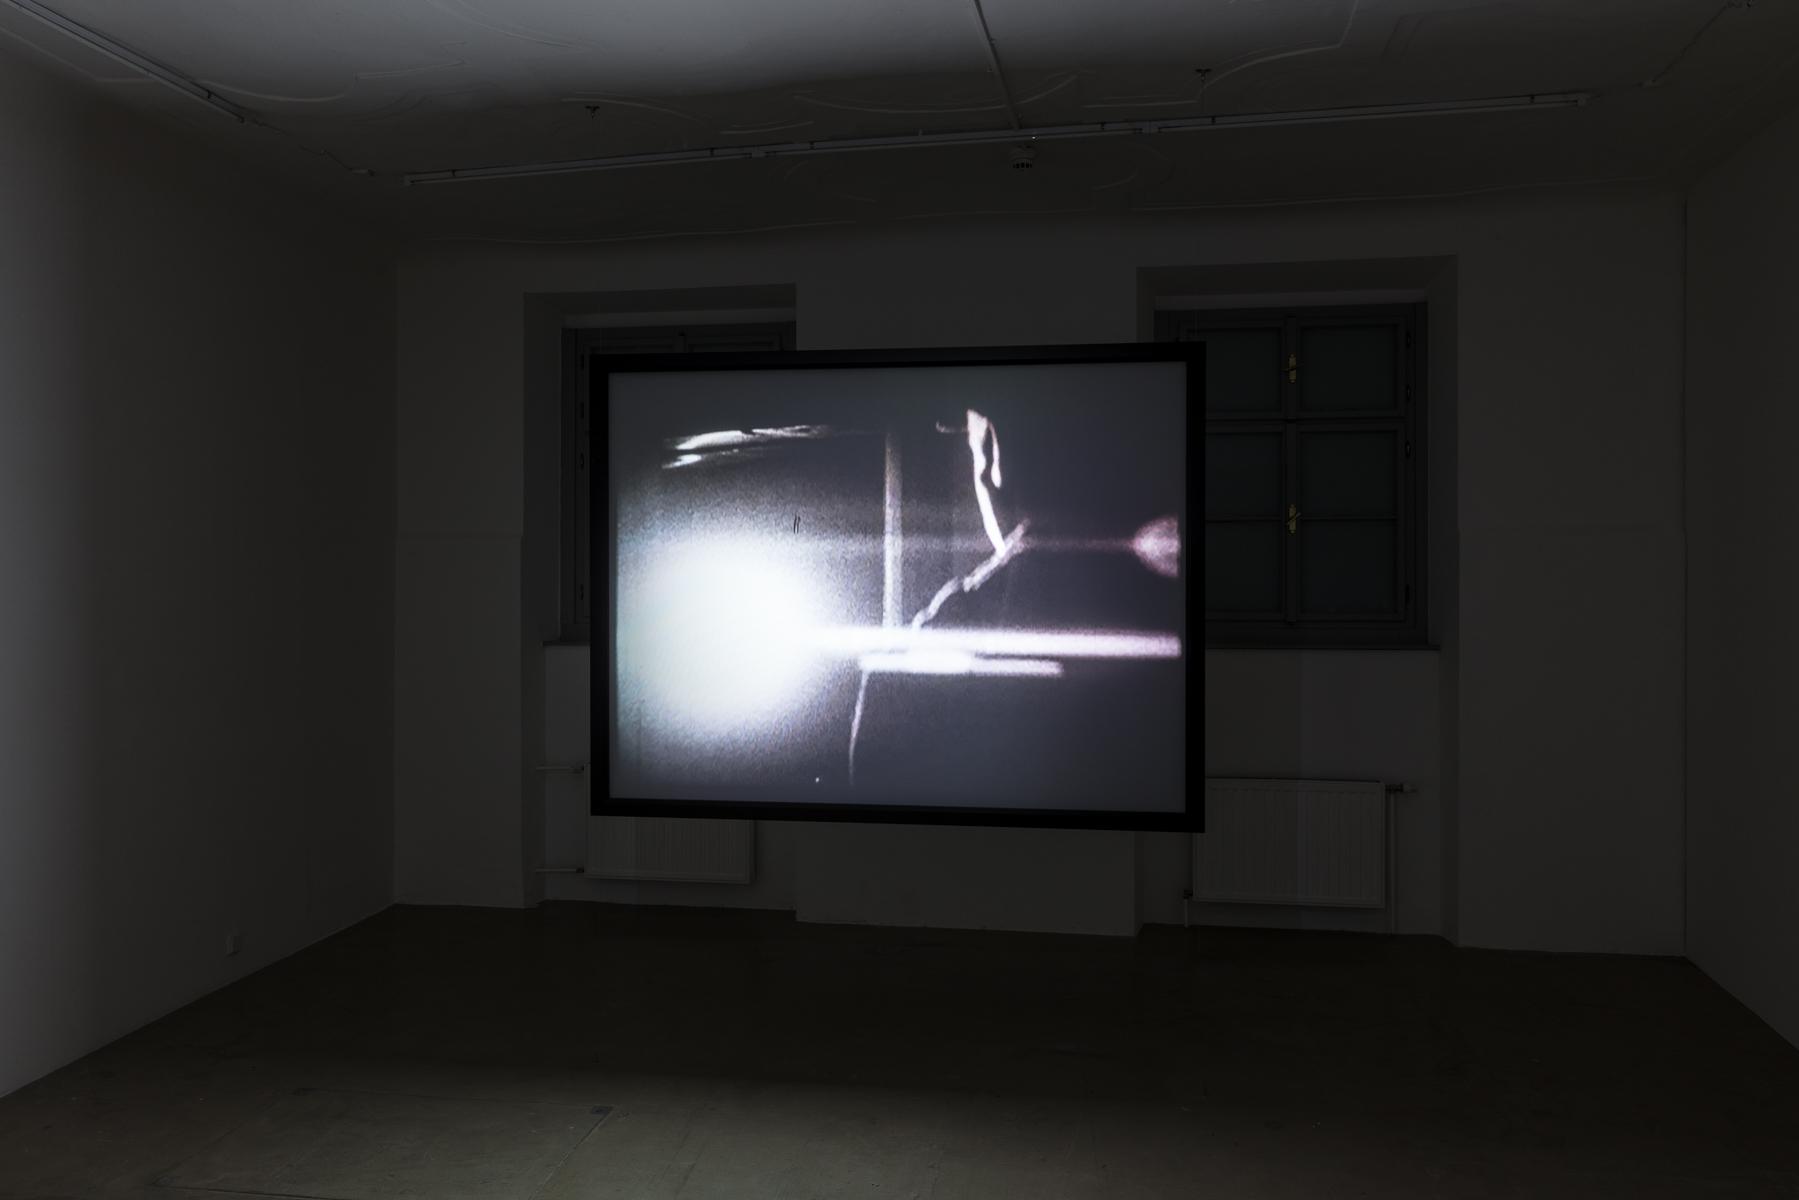 2019_03_11_Grazer Kunstverein_060_web.jpg